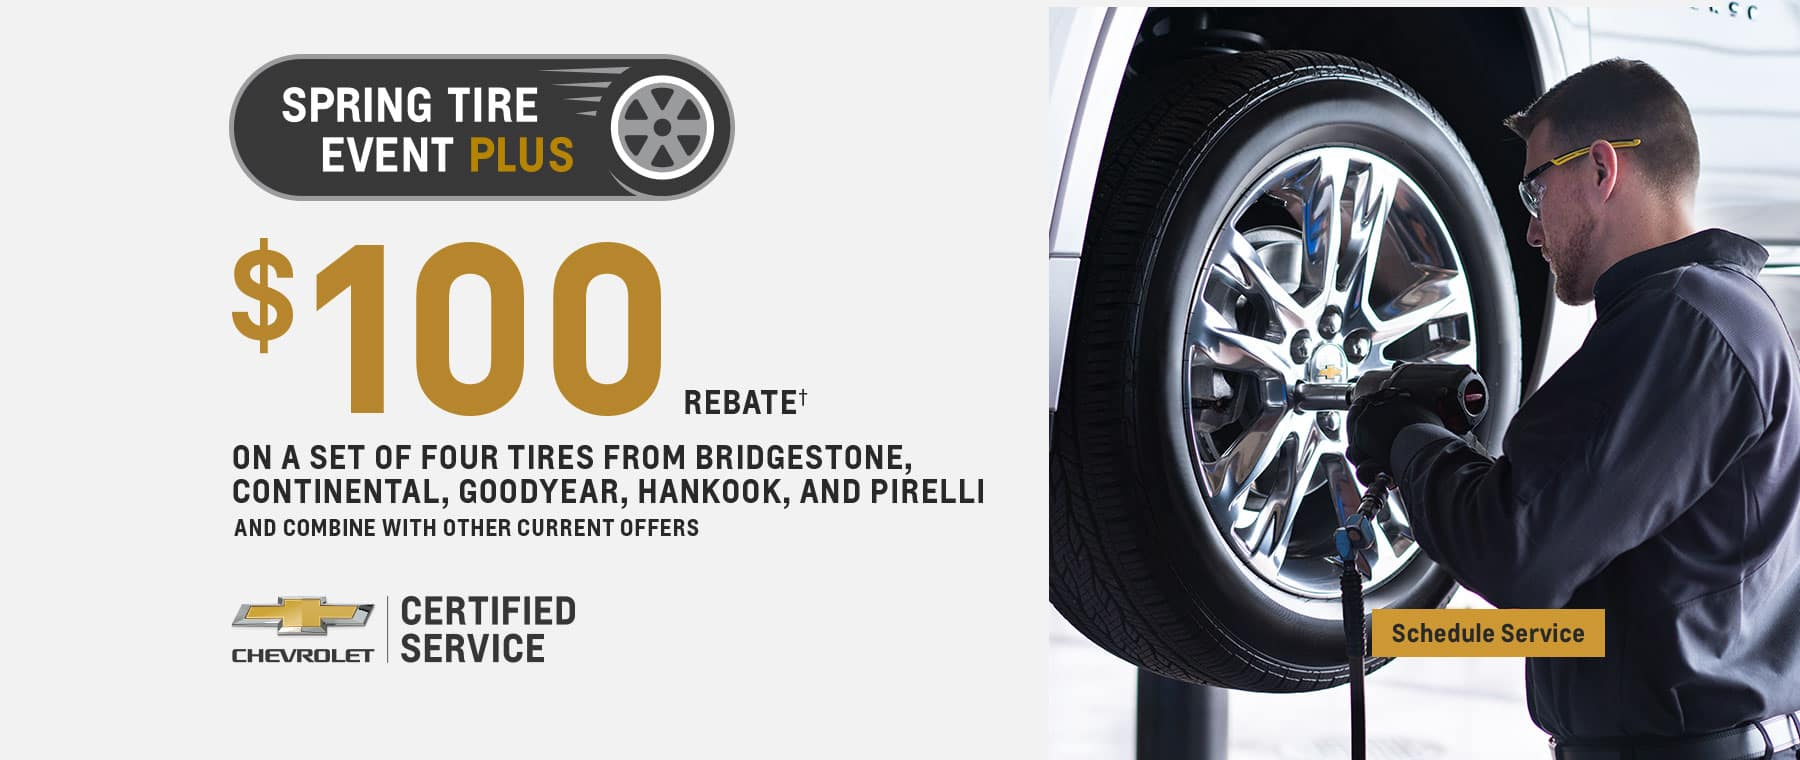 Chevrolet Certified Service $100 Rebate man fixing tire